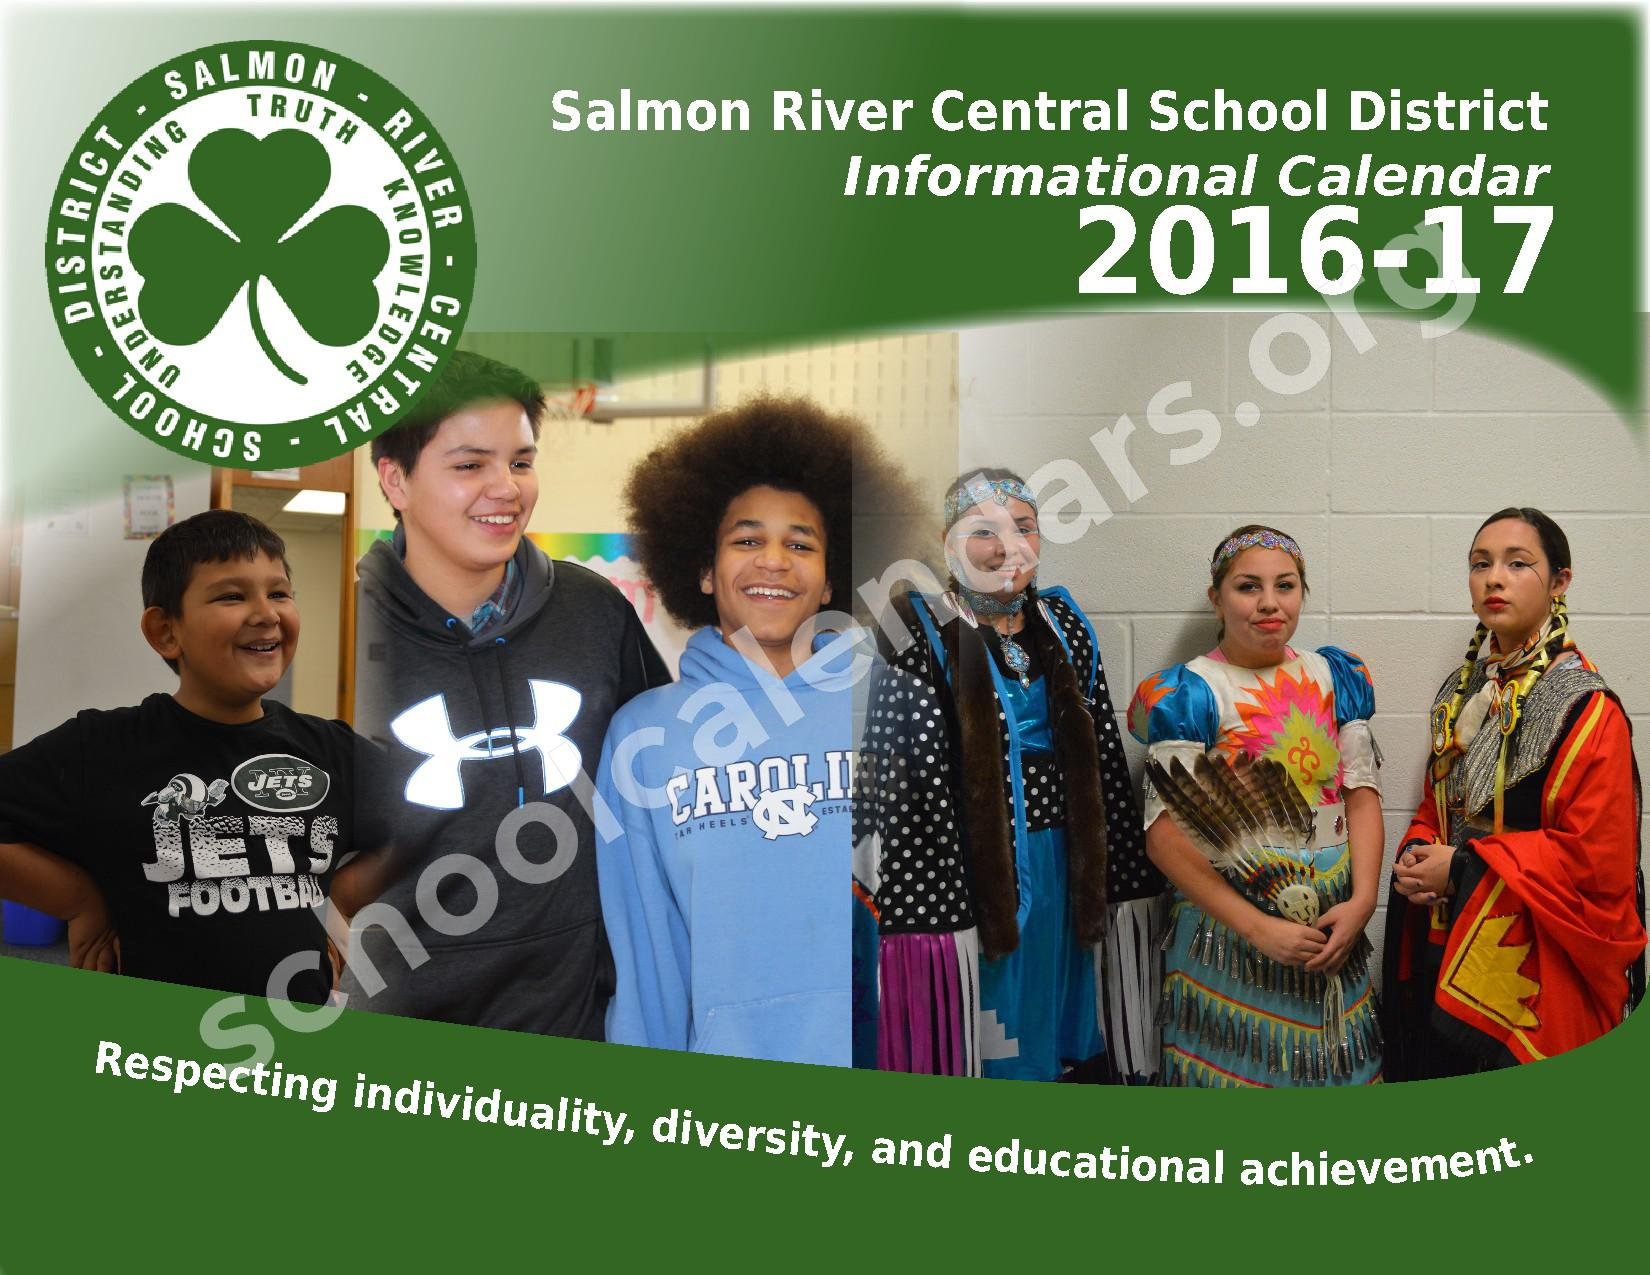 2016 - 2017 School Calendar – Salmon River Central School District – page 1